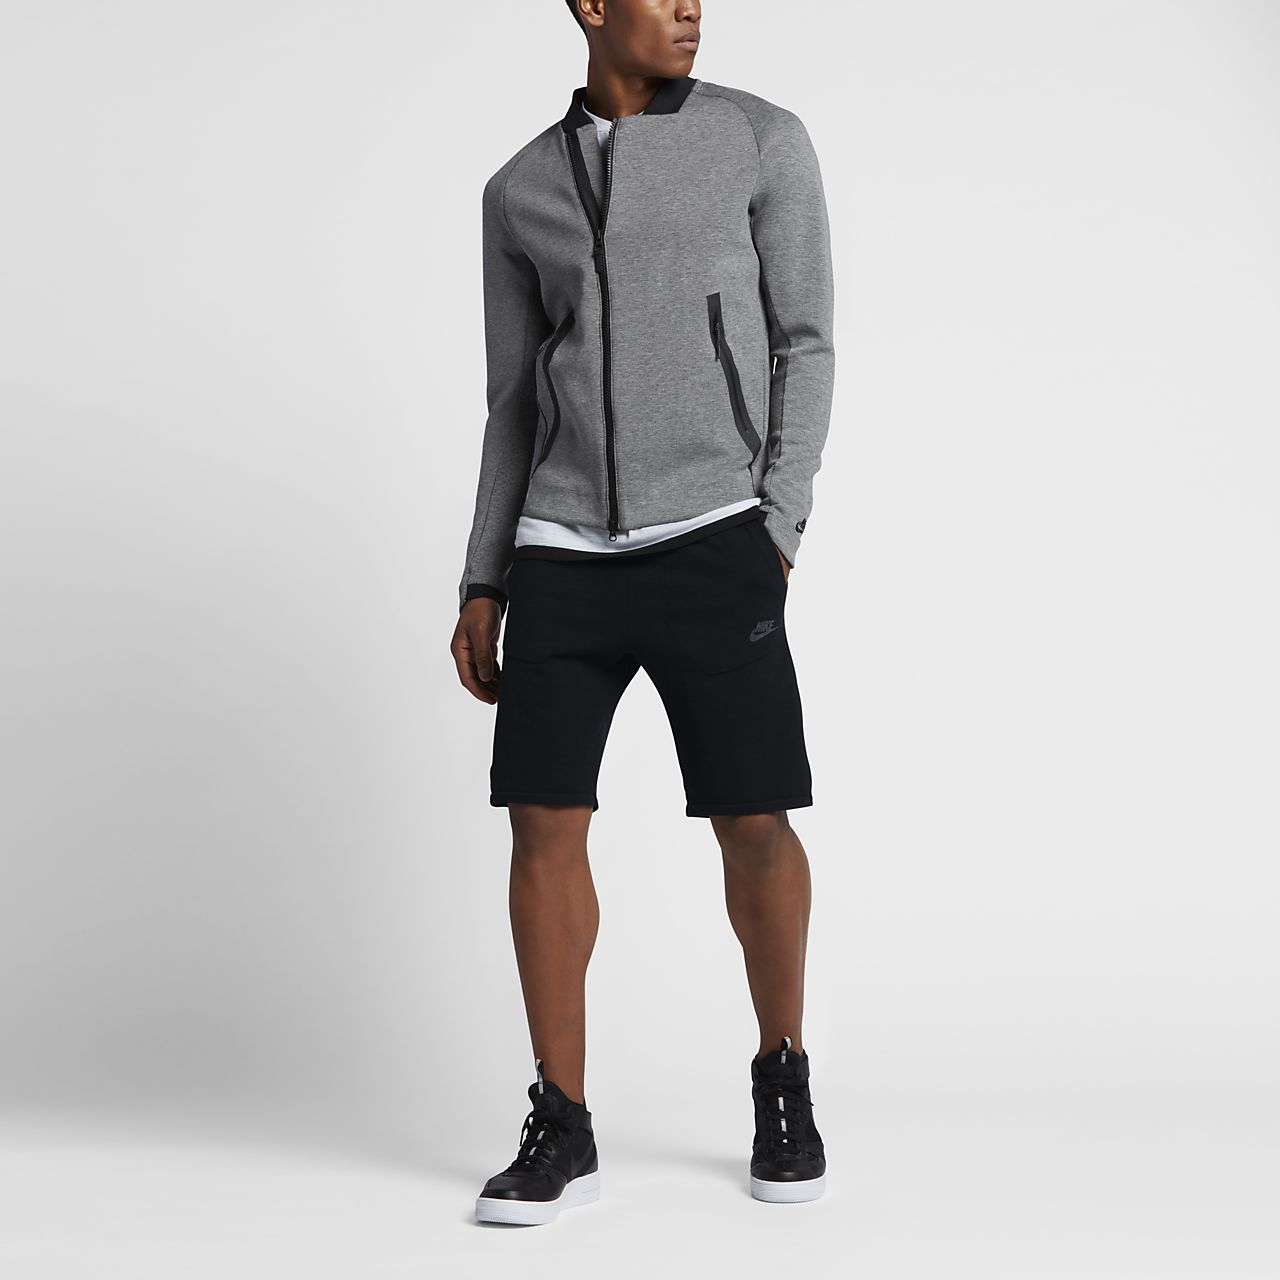 7bc3c910e4 Nike Sportswear Tech Knit Men's Shorts. Nike.com SG